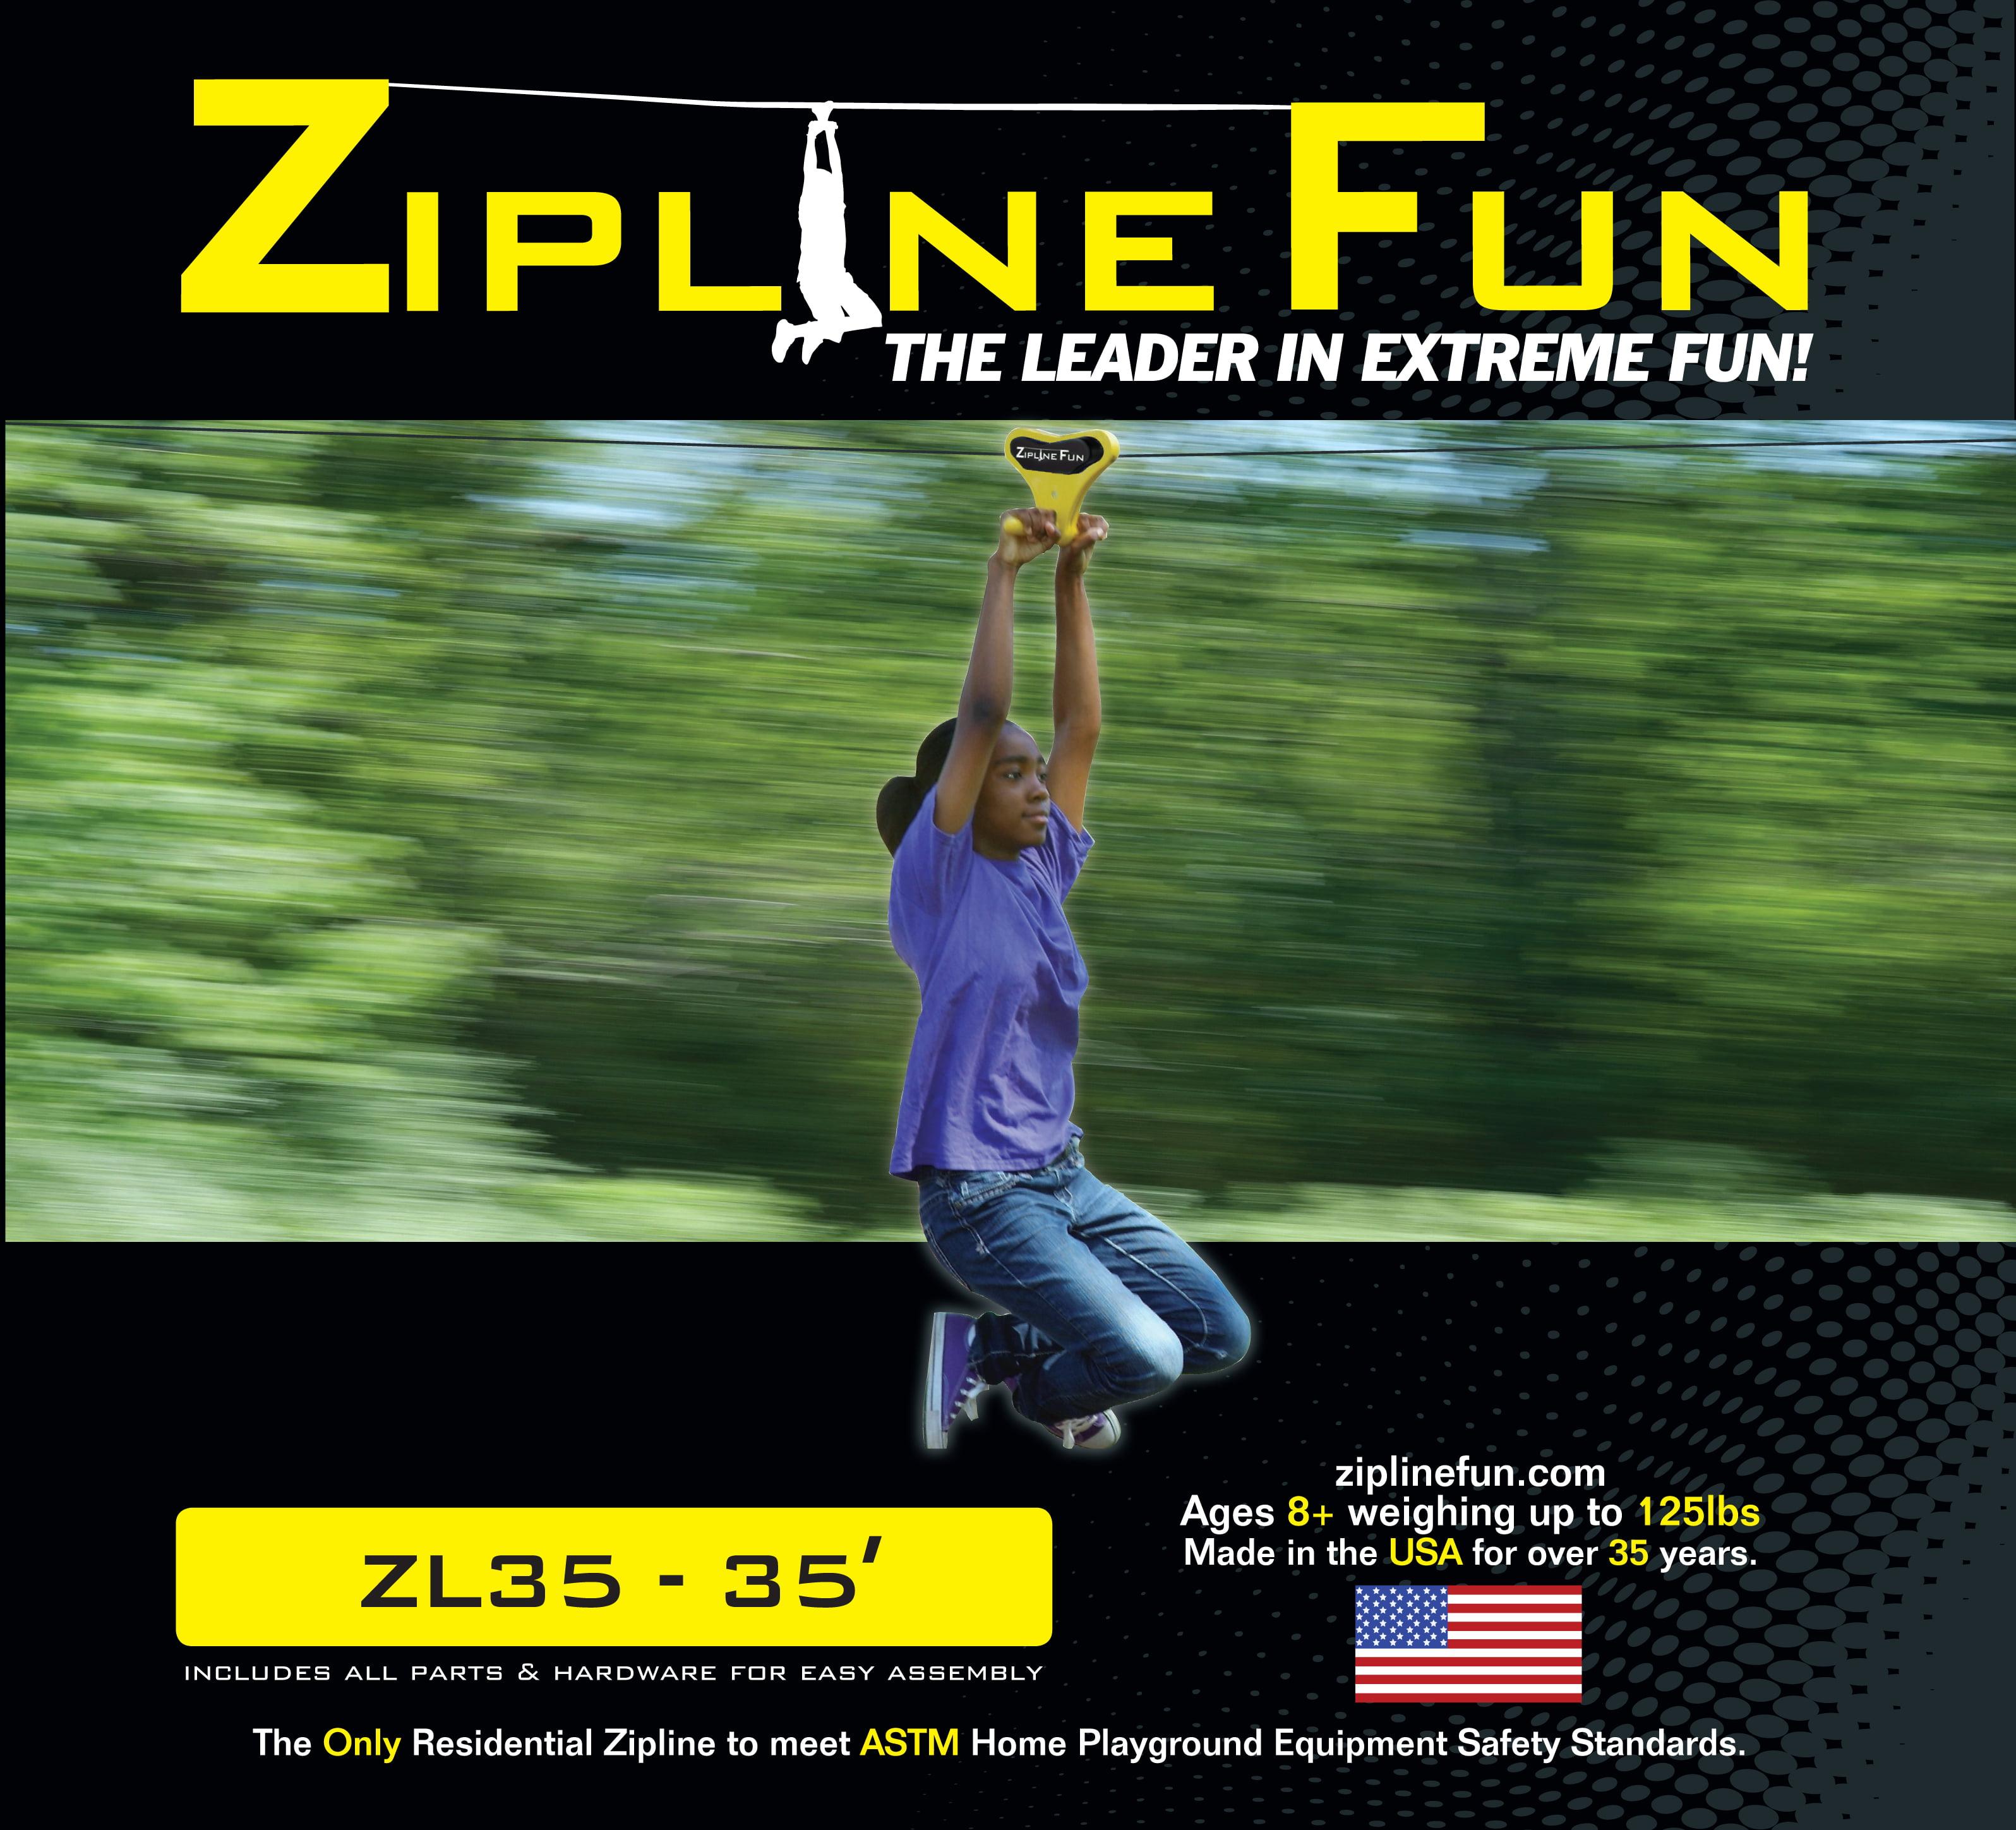 Ziplining scrapbook ideas - Ziplining Scrapbook Ideas 40